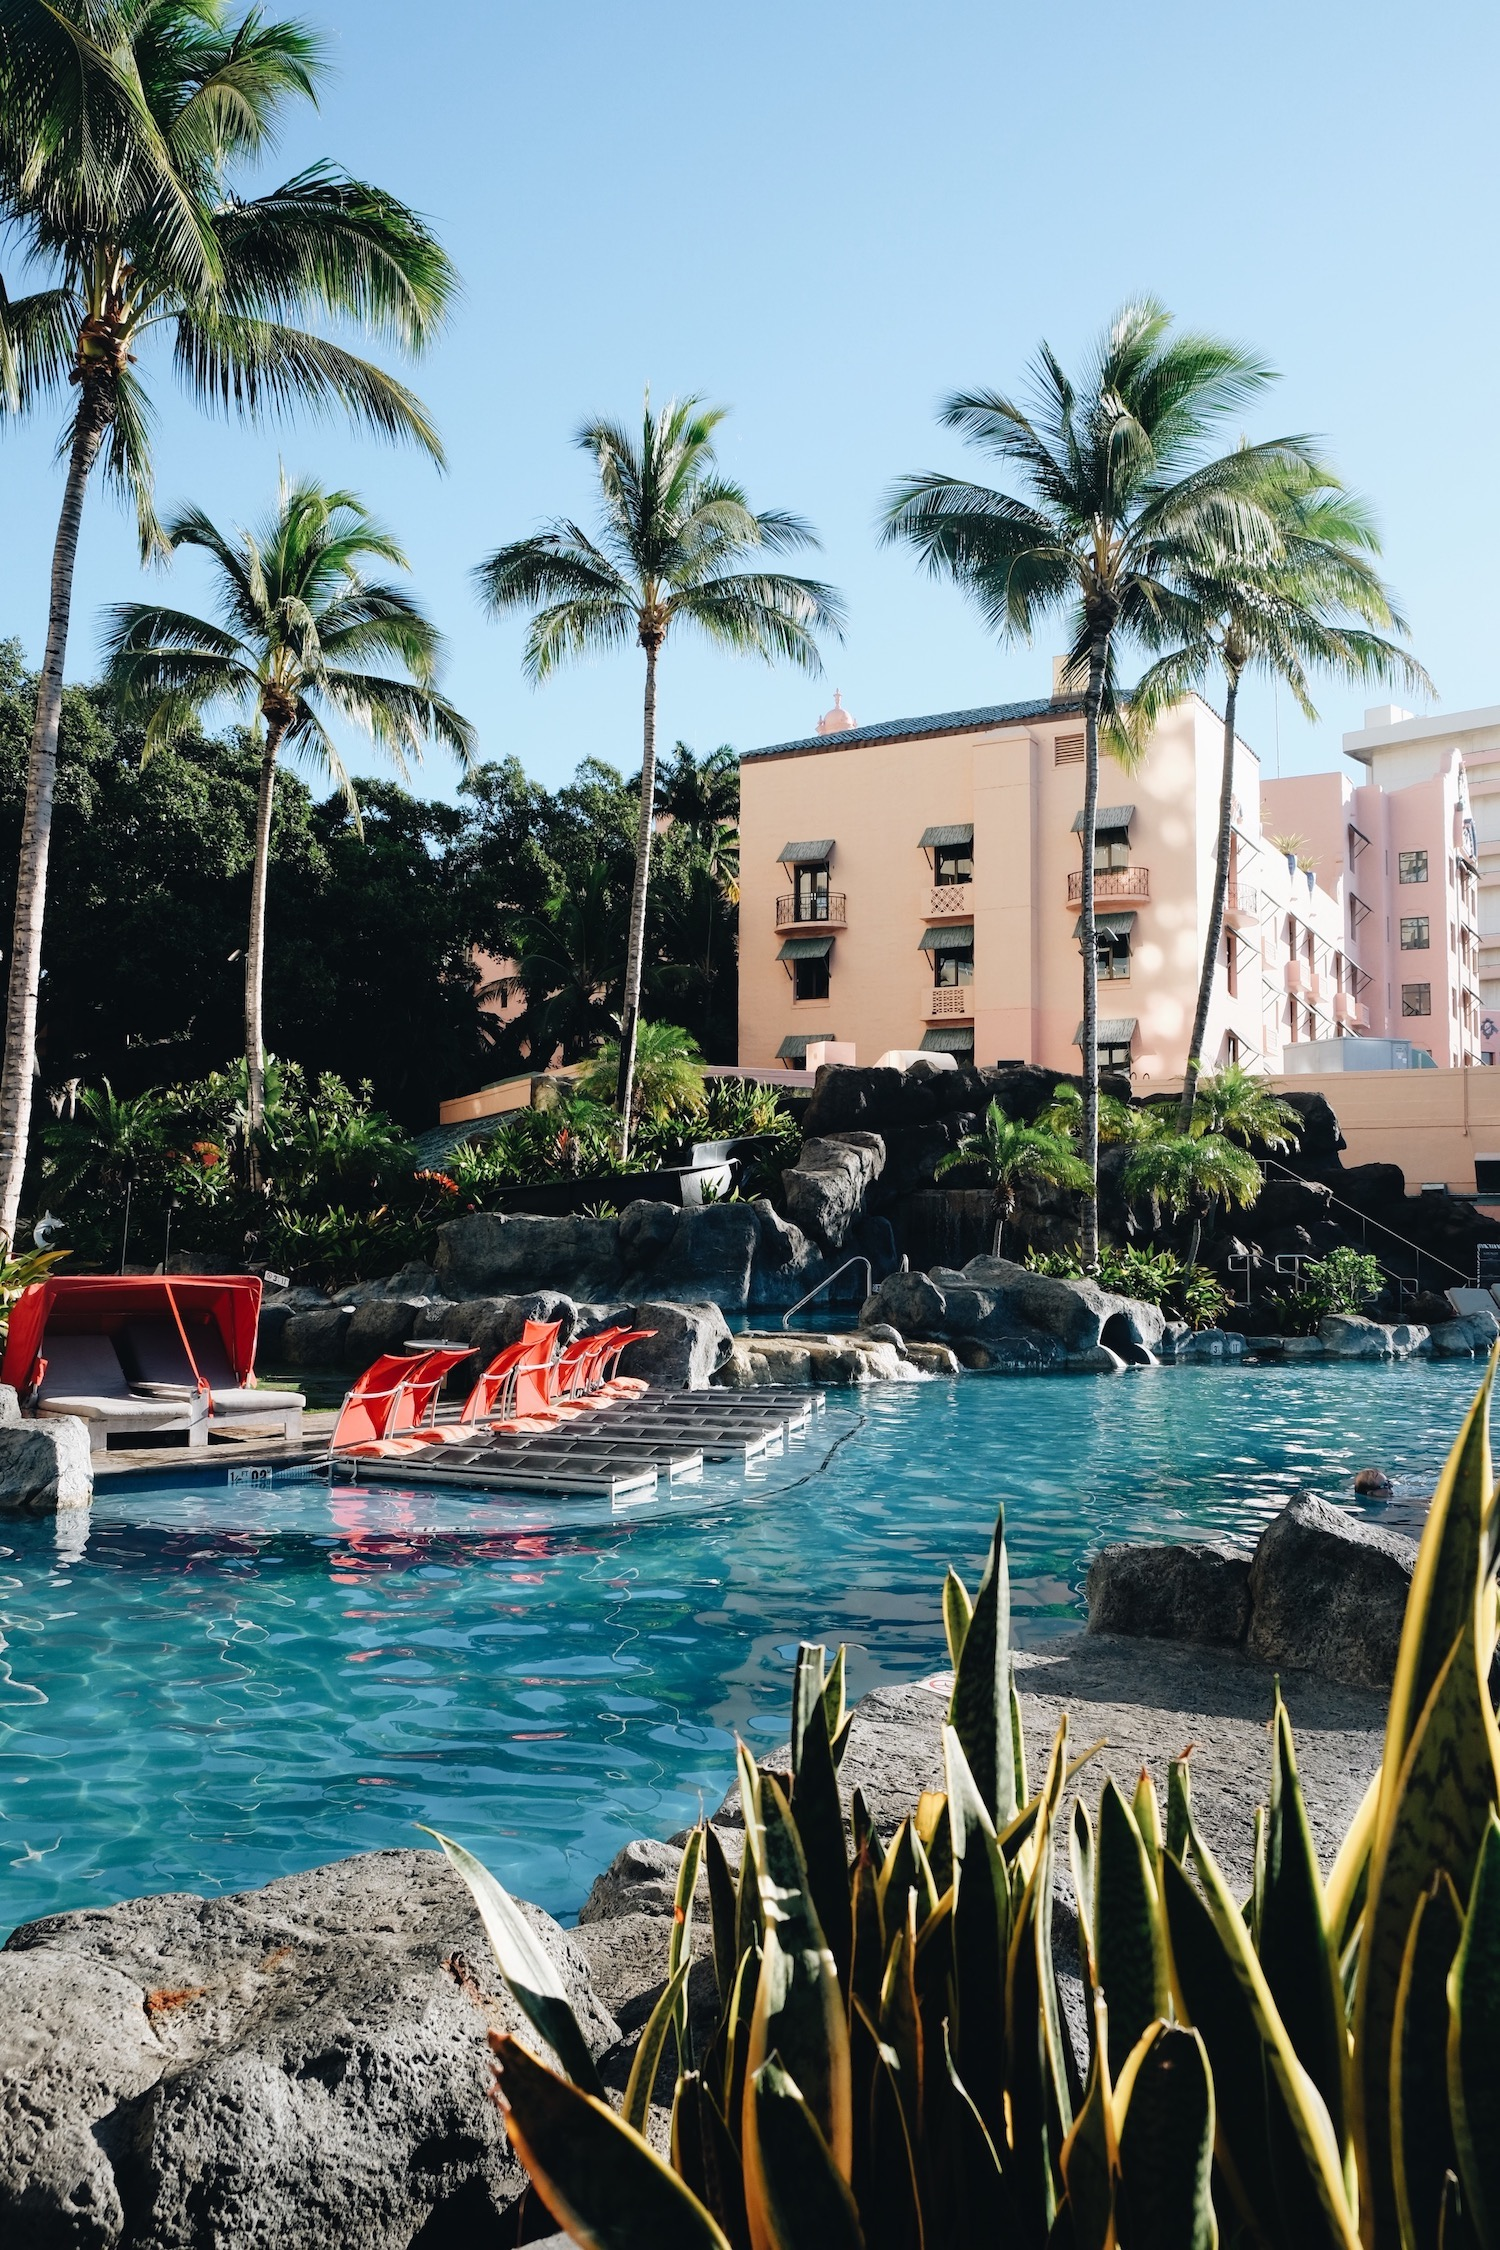 Home Sweet Hotel: The Royal Hawaiian | truelane